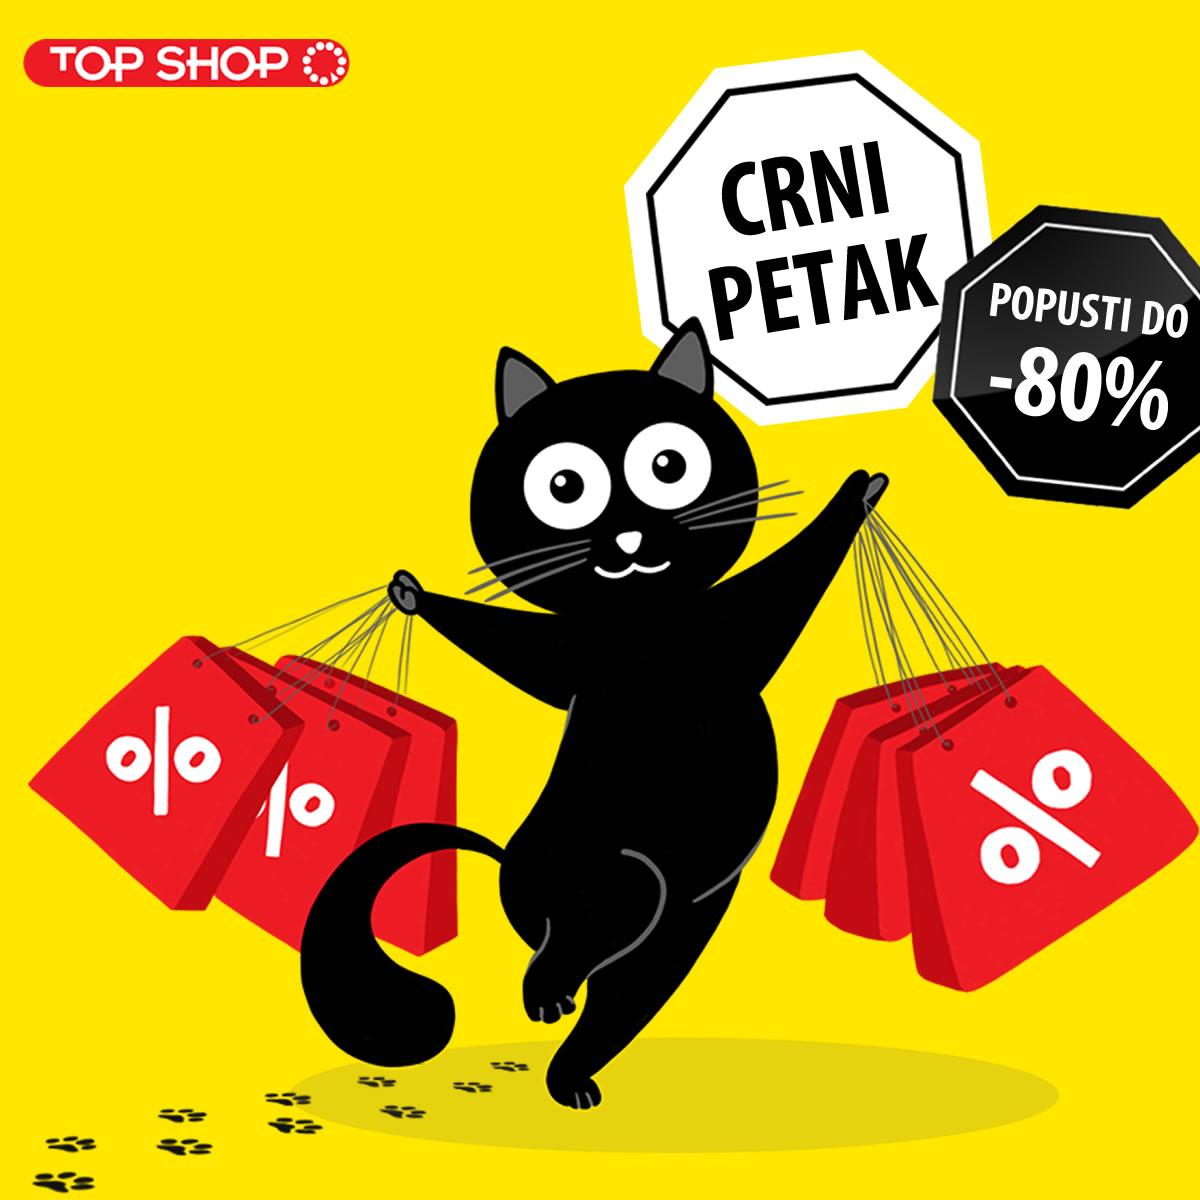 Facebook Crni petak Top Shop1